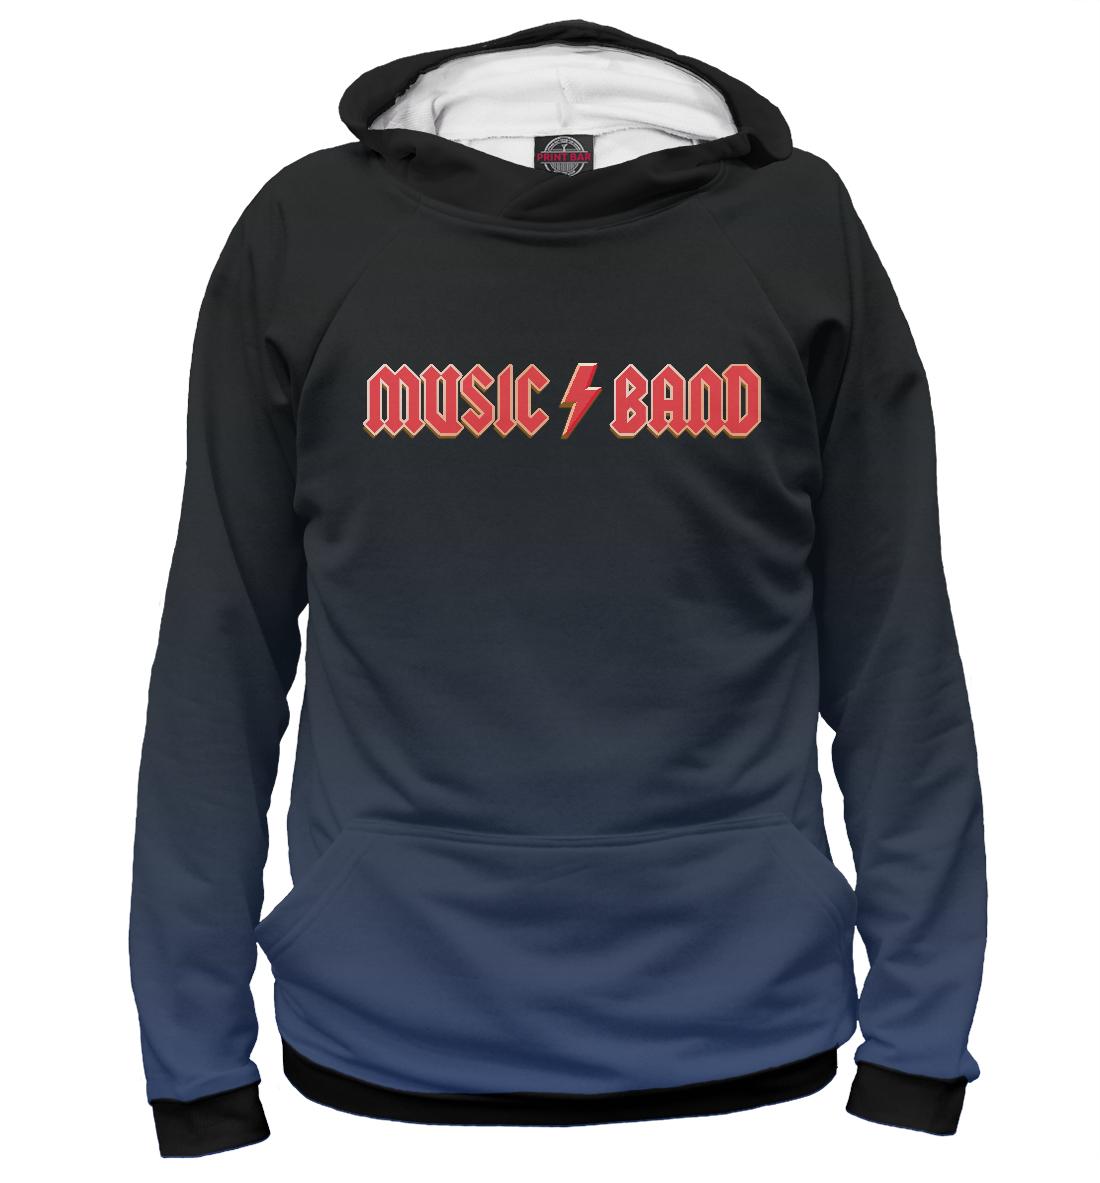 Music Band mikael niemi popular music